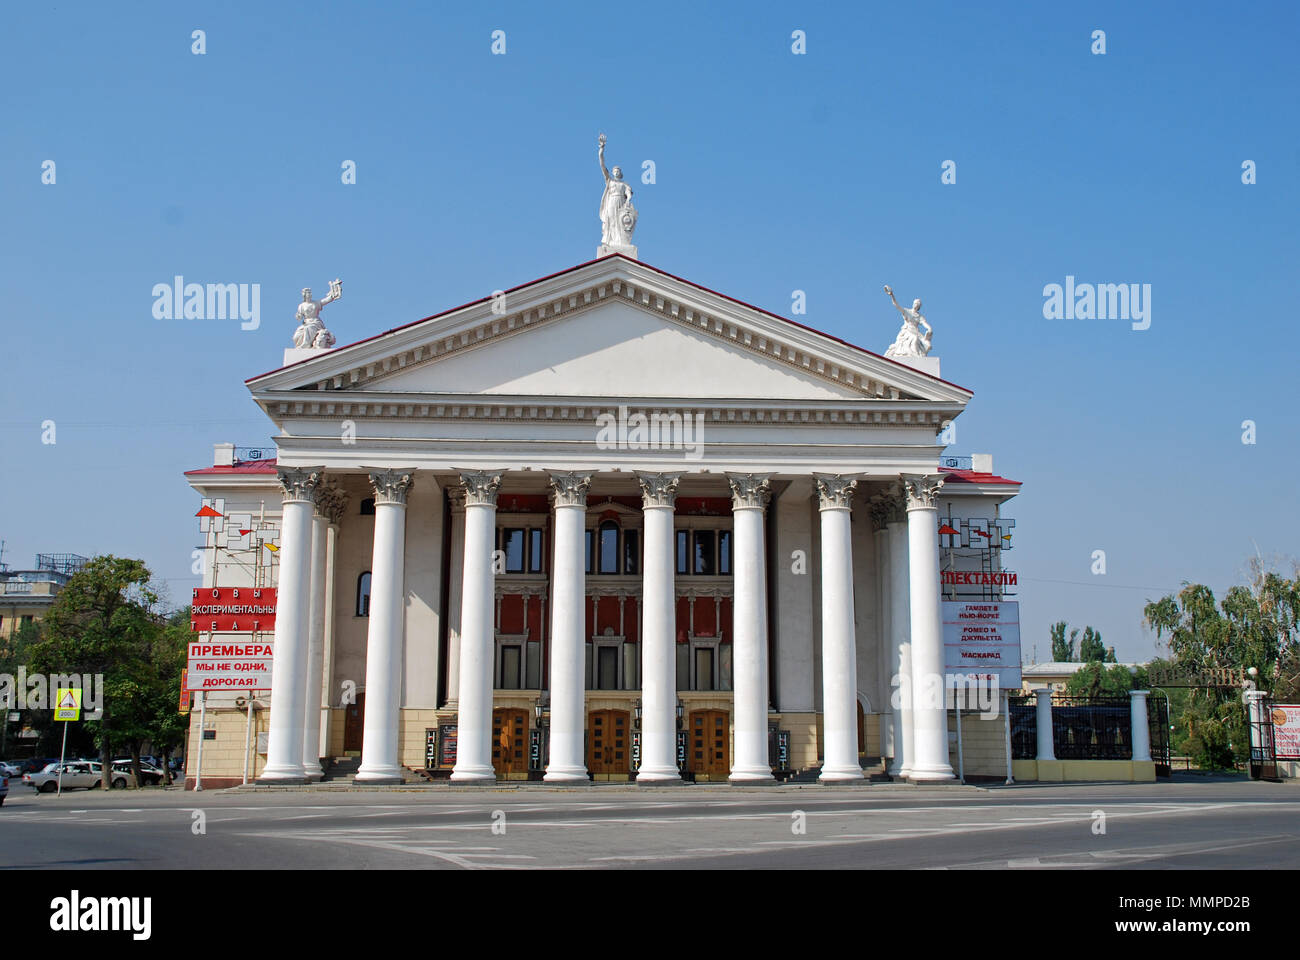 Die neuen experimentellen Theater auf Pavshikh Bortsov Square in Wolgograd, Russland Stockbild